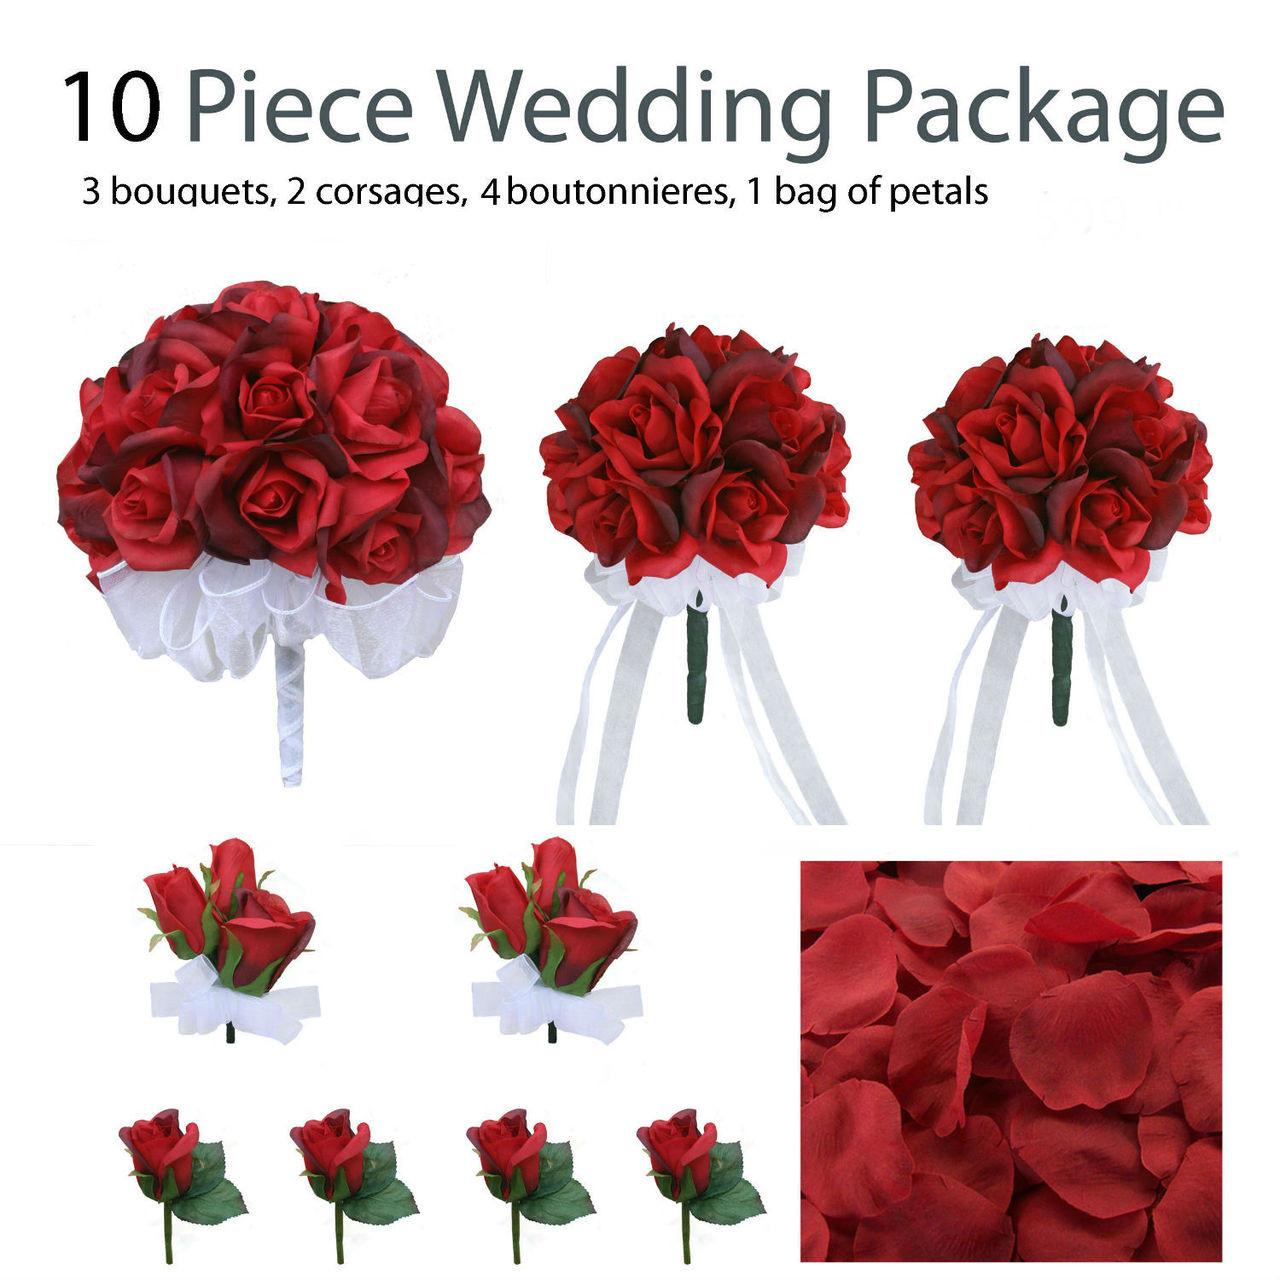 Bridal Bouquet Silk Wedding Flowers: Red Rose Wedding Flower Package